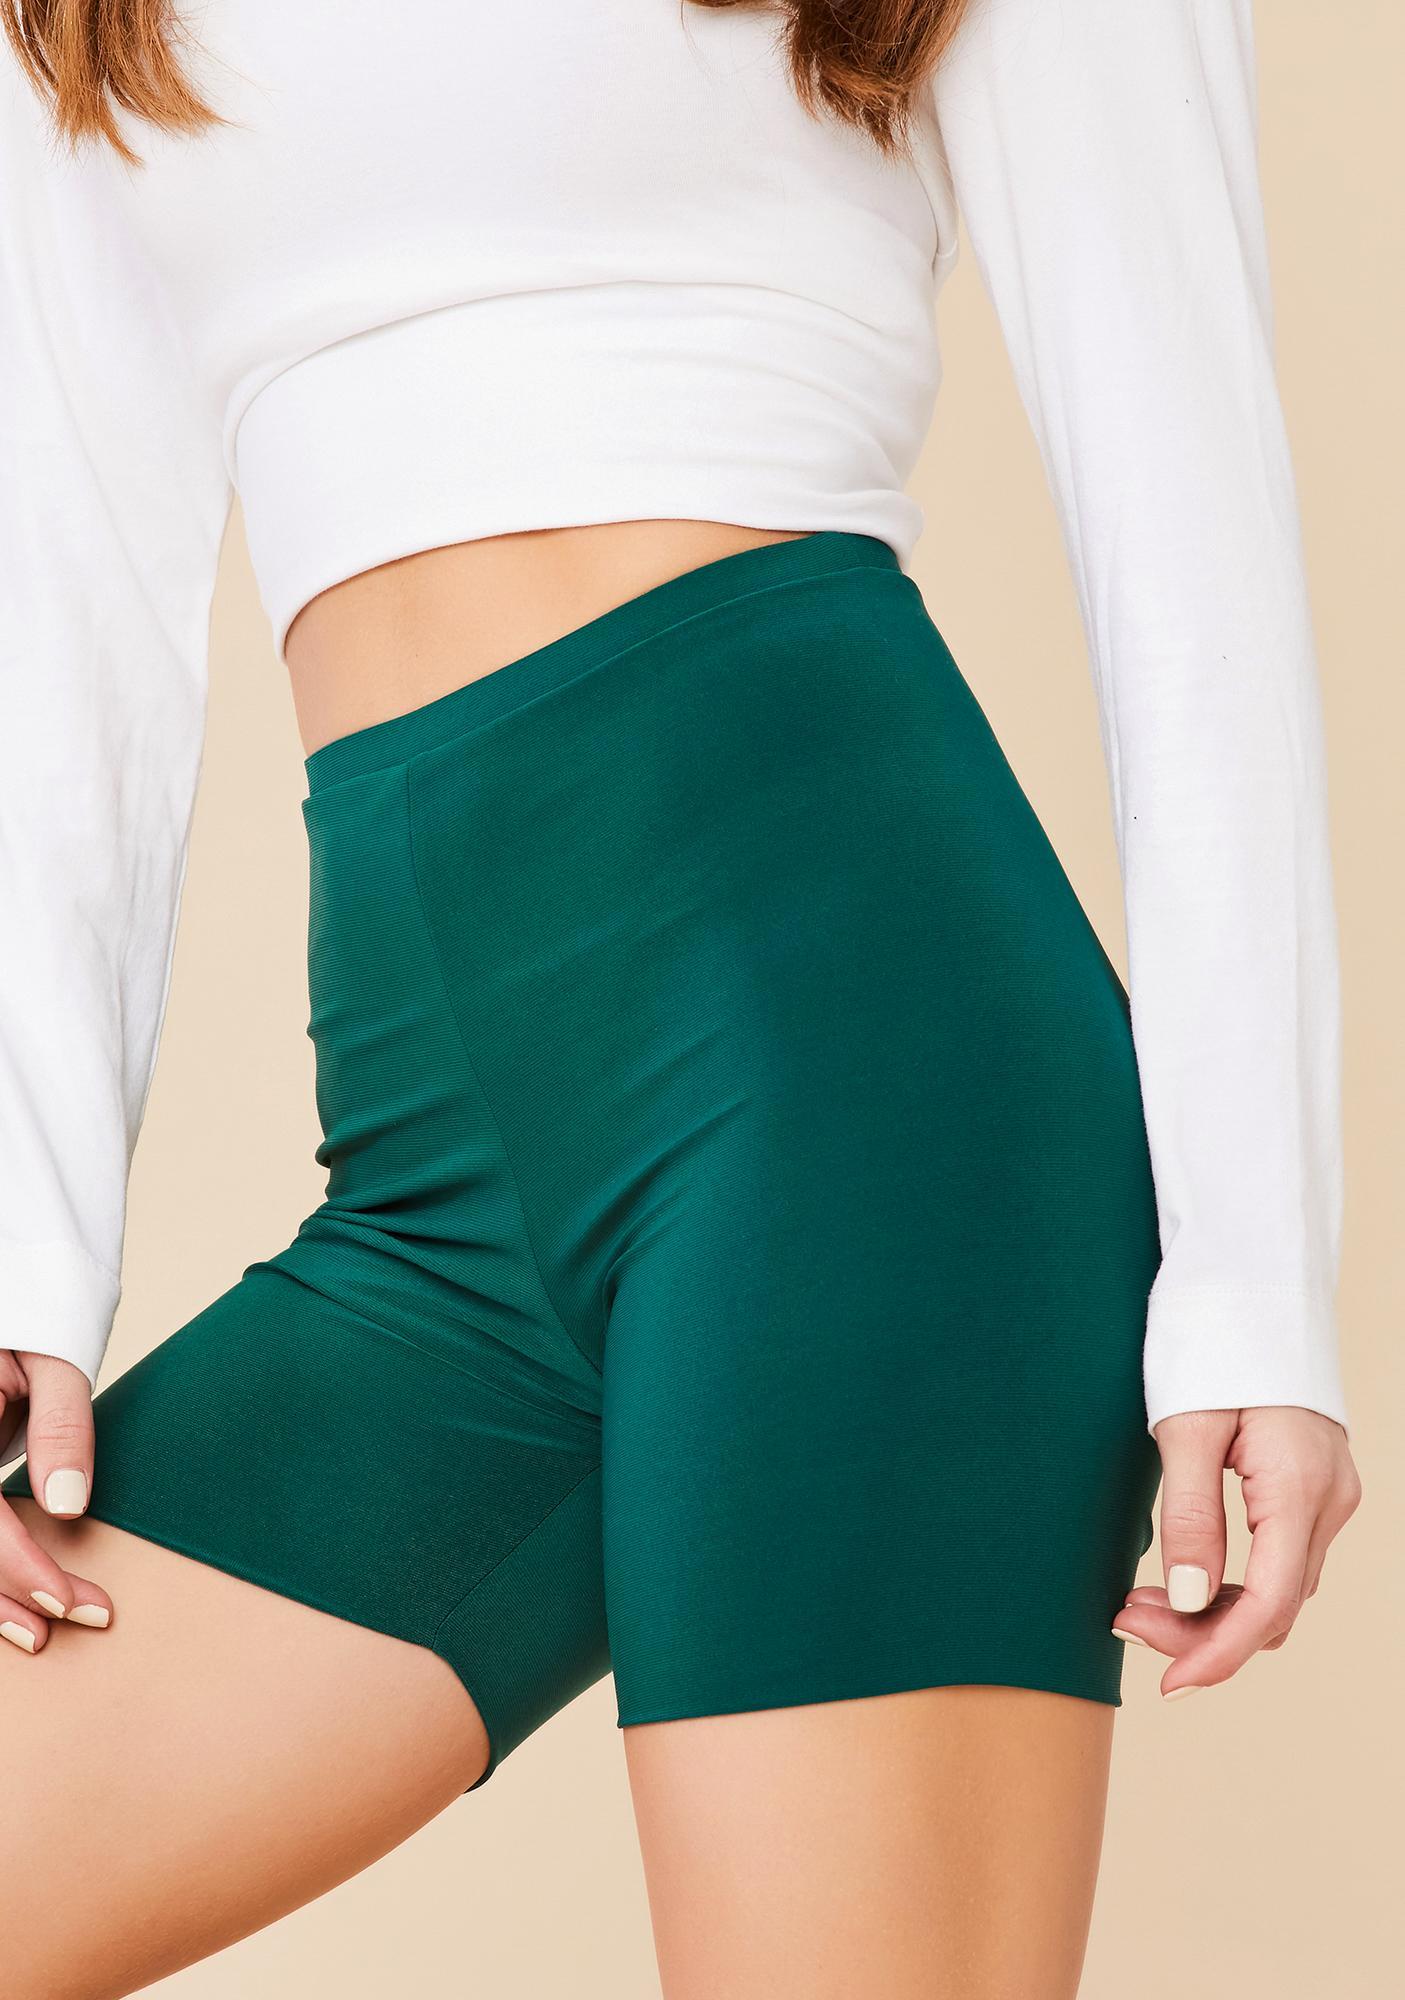 Rave shorts Festival outfit Knee length shorts Printed biker shorts High waisted womens shorts